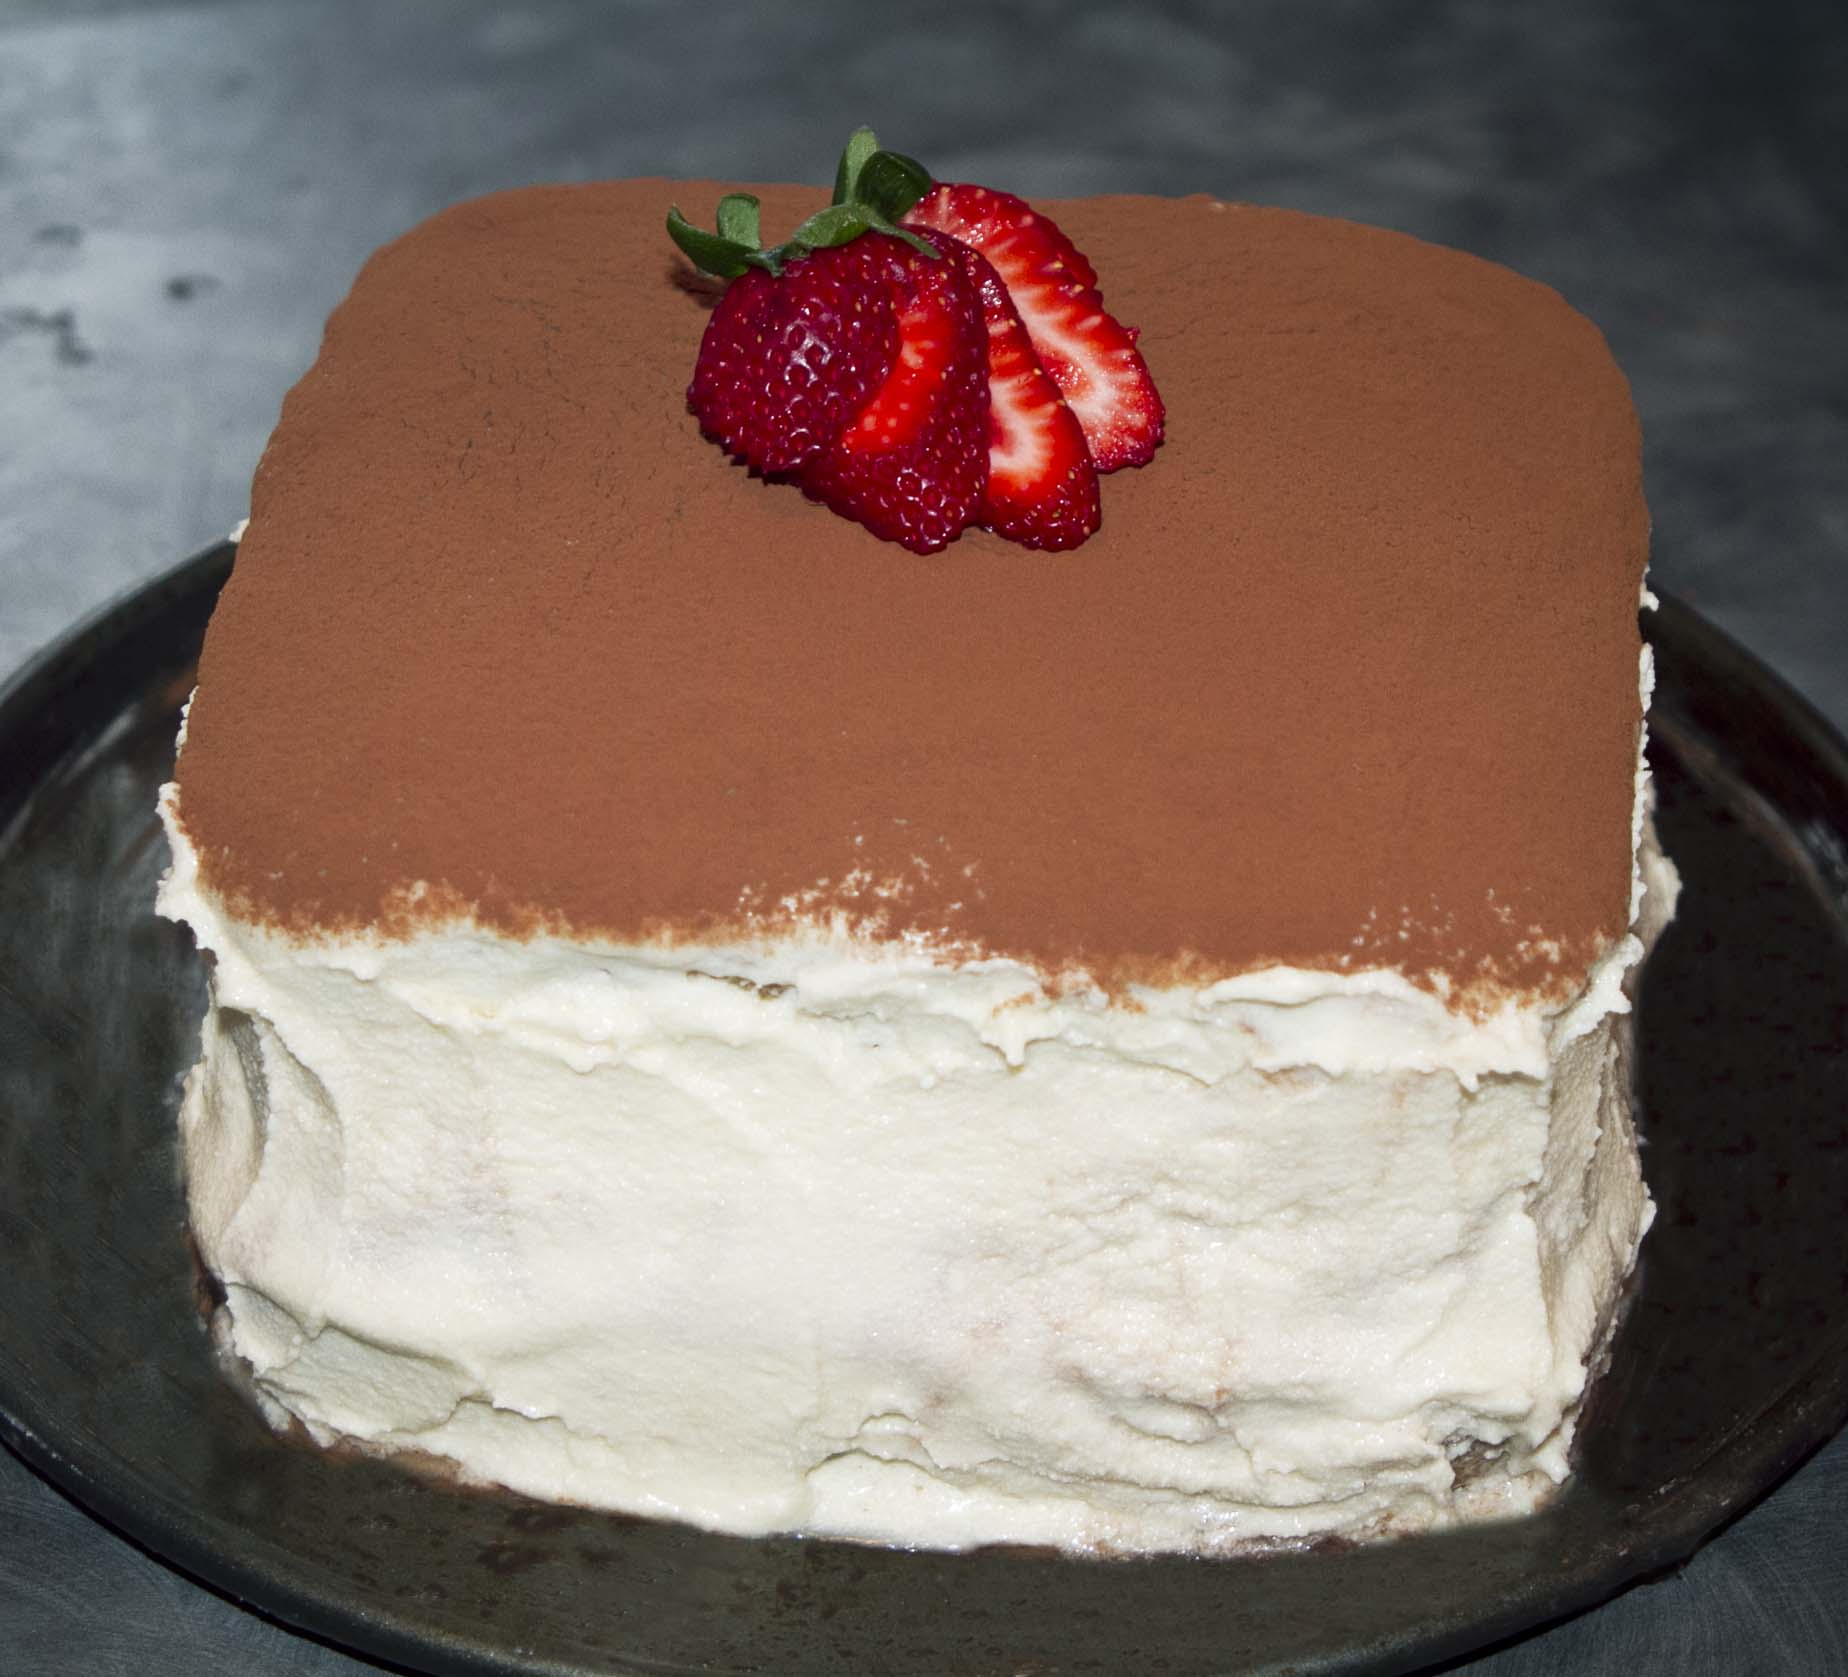 Vegan Ice Cream Cake The Kat